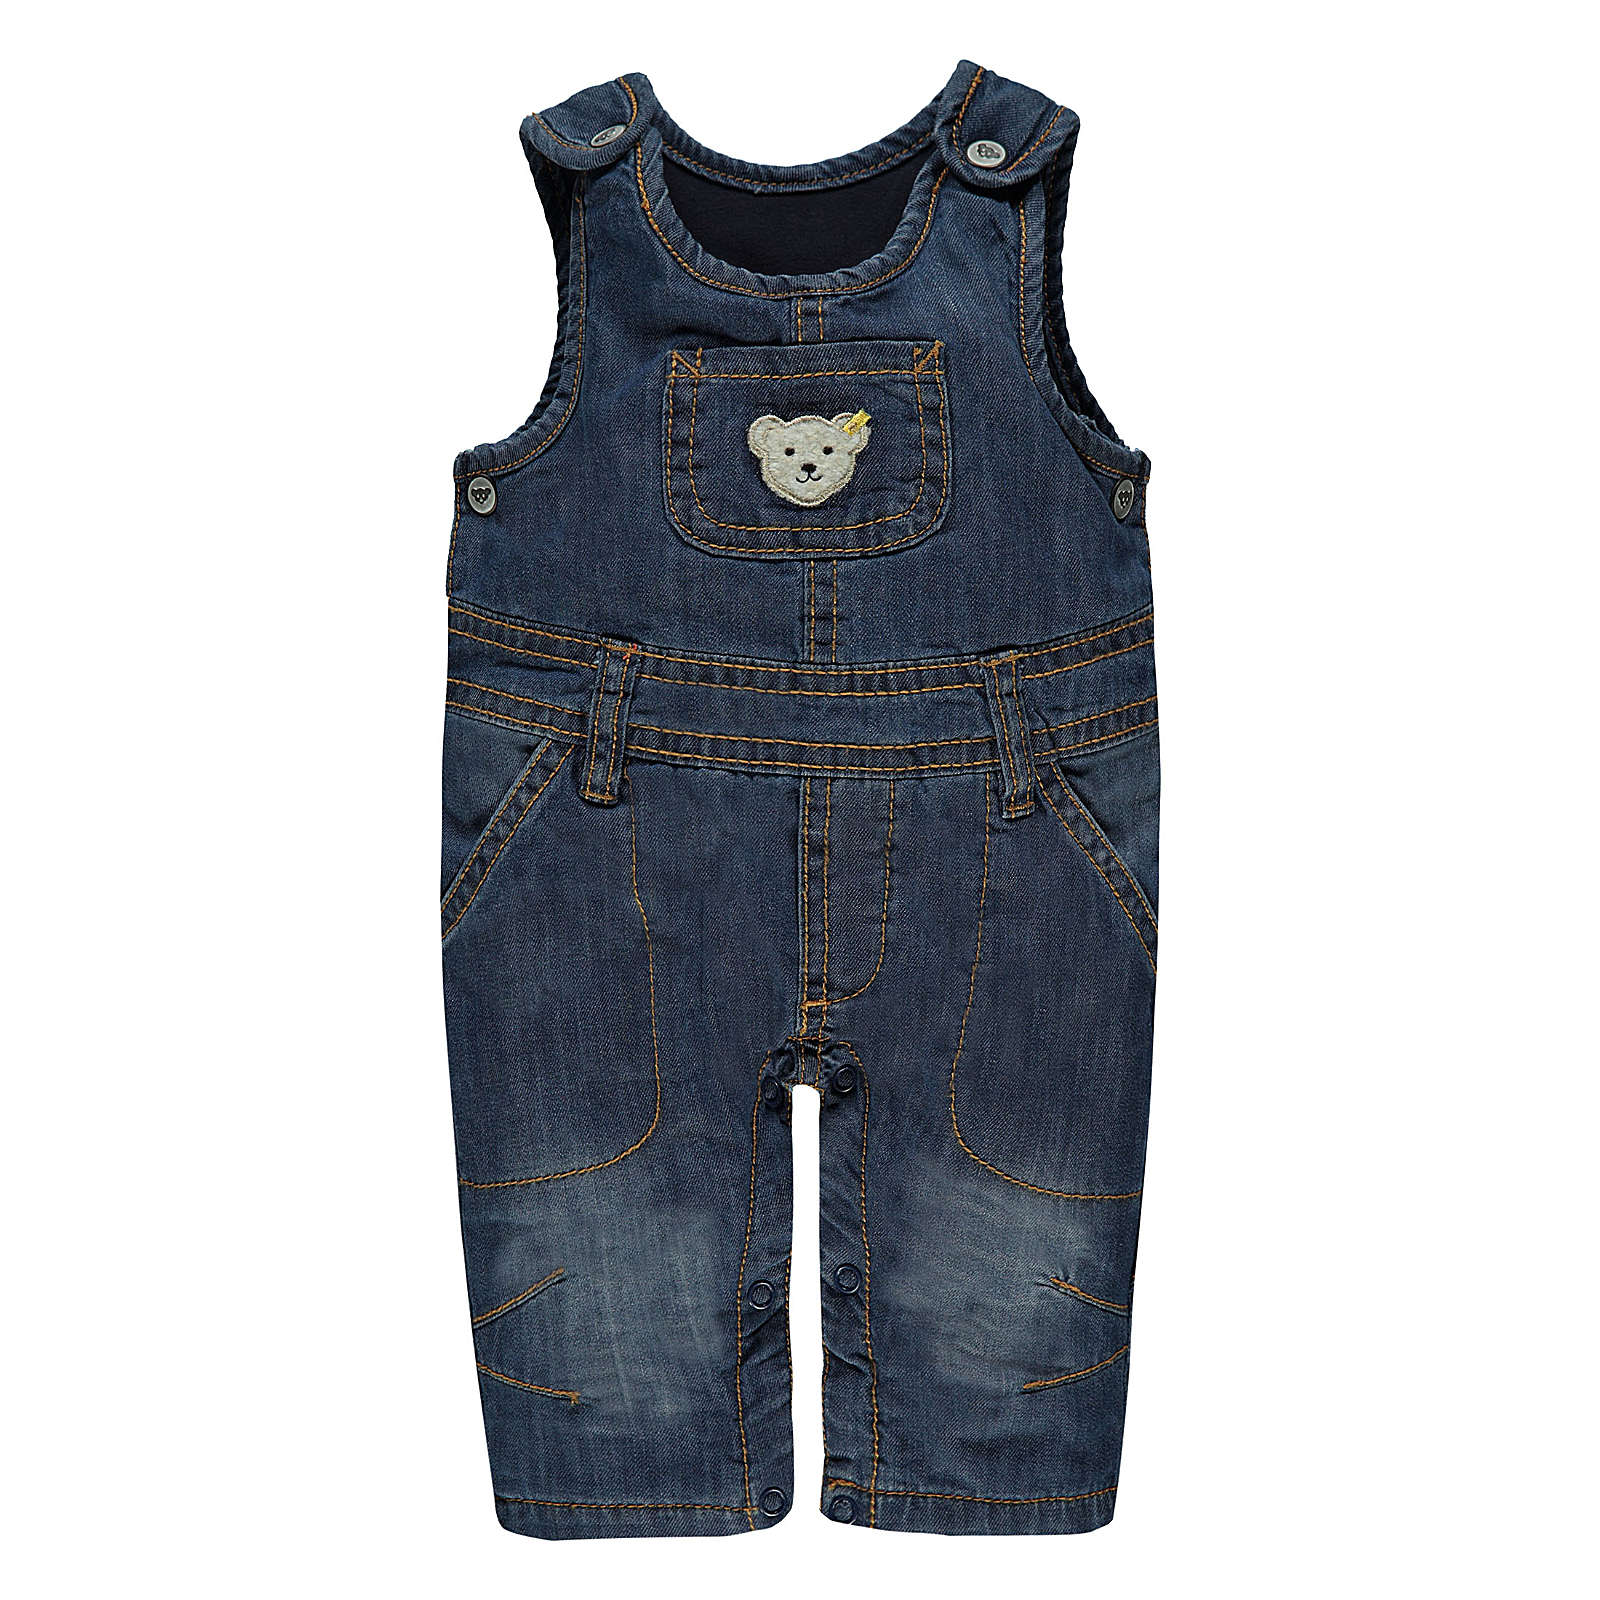 bdc2d96fc1638 Steiff Baby Latzhosen für Jungen blue denim Jun.